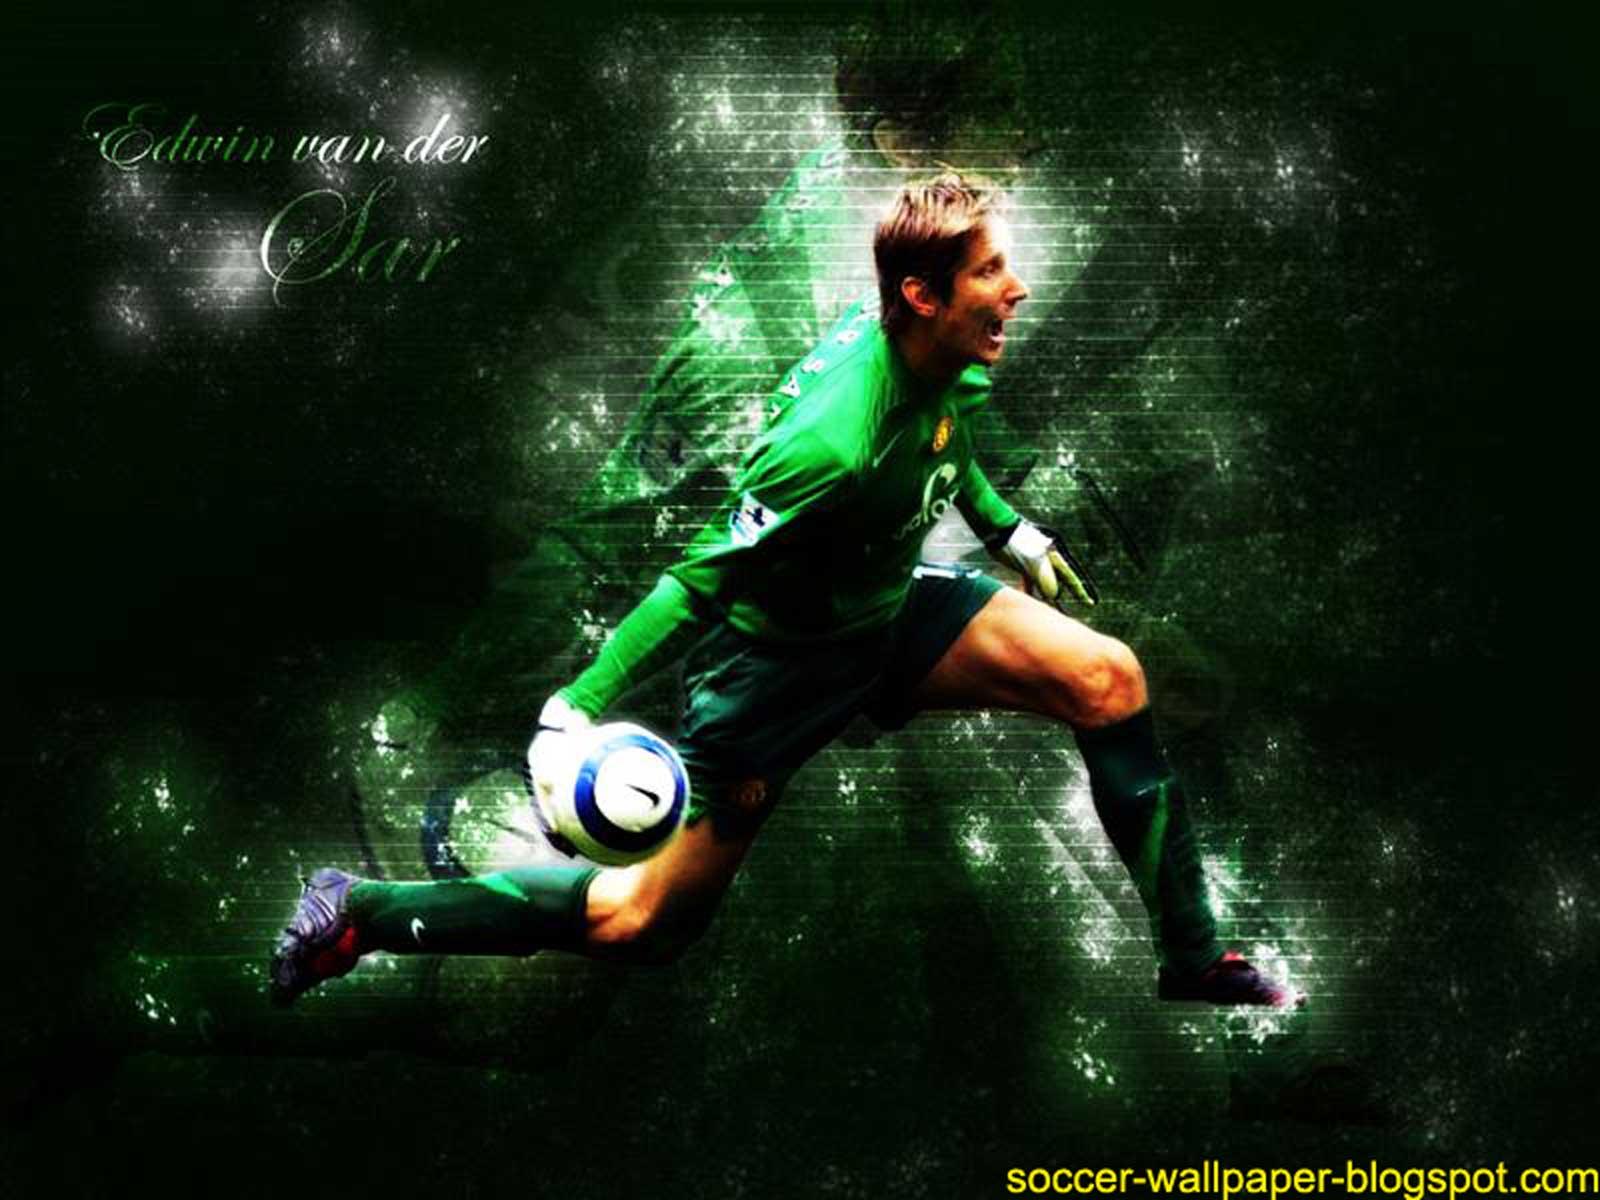 Soccer Wallpaper: Top 20 Soccer Wallpaper